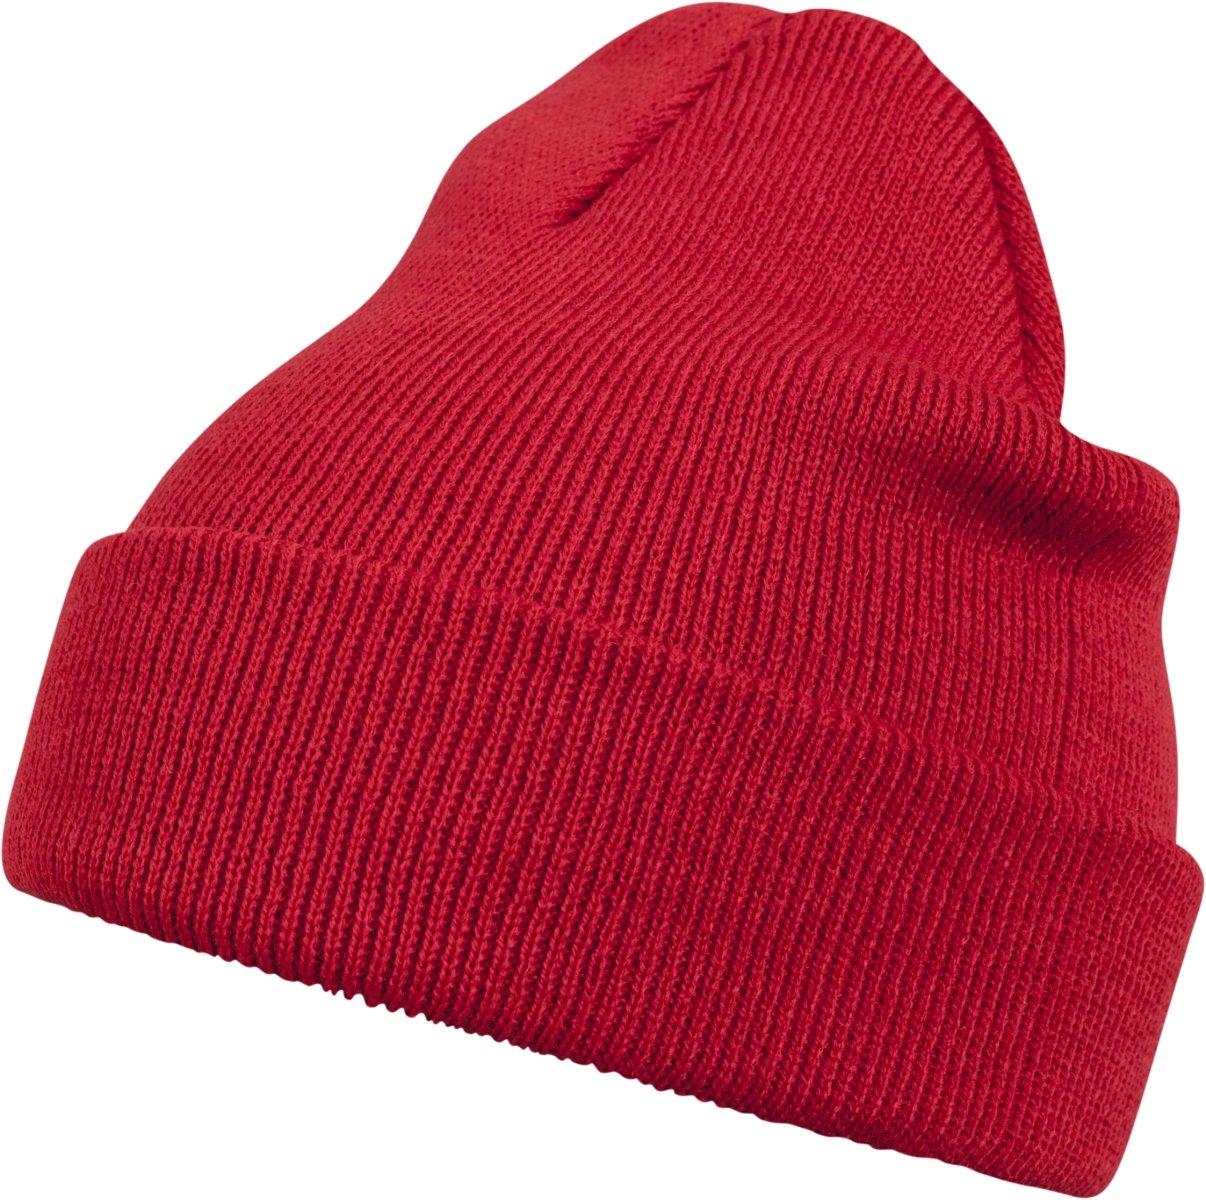 MSTRDS 10248, Cappello Invernale Unisex